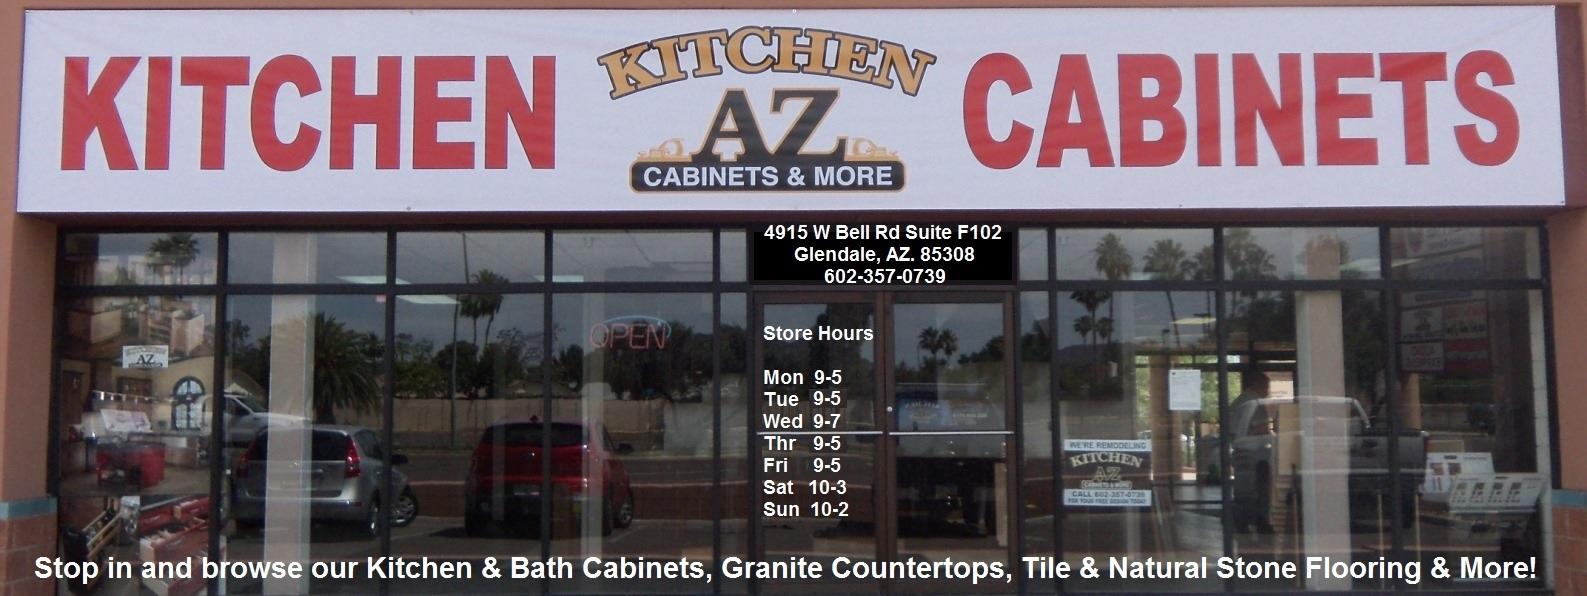 glendale az kitchen cabinets remodeling showroom - Kitchen Cabinets Arizona